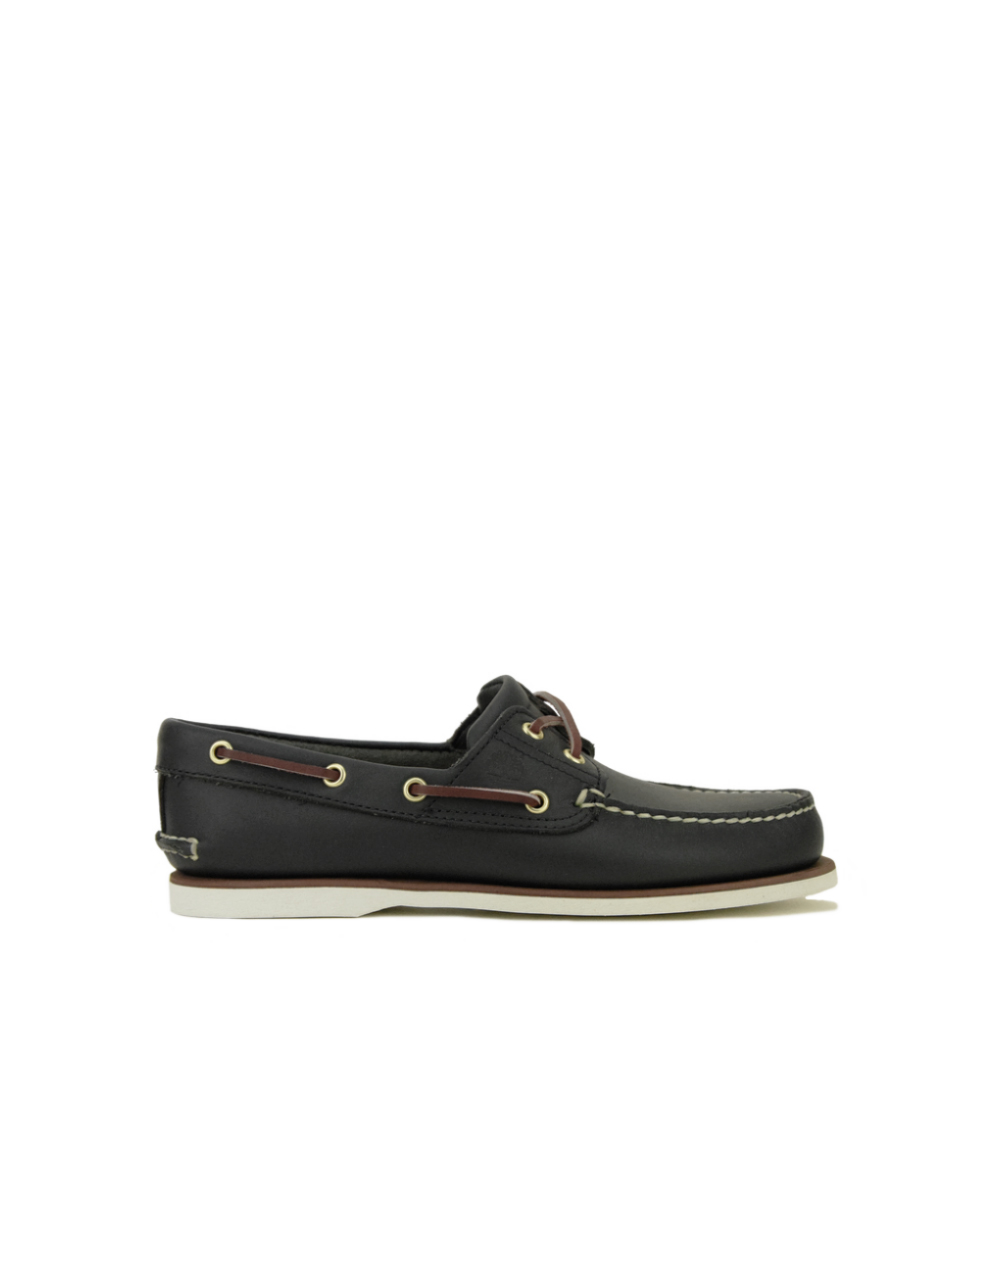 Timberland Classic 2 Eye Boat Shoe (TB074036 484) Blue